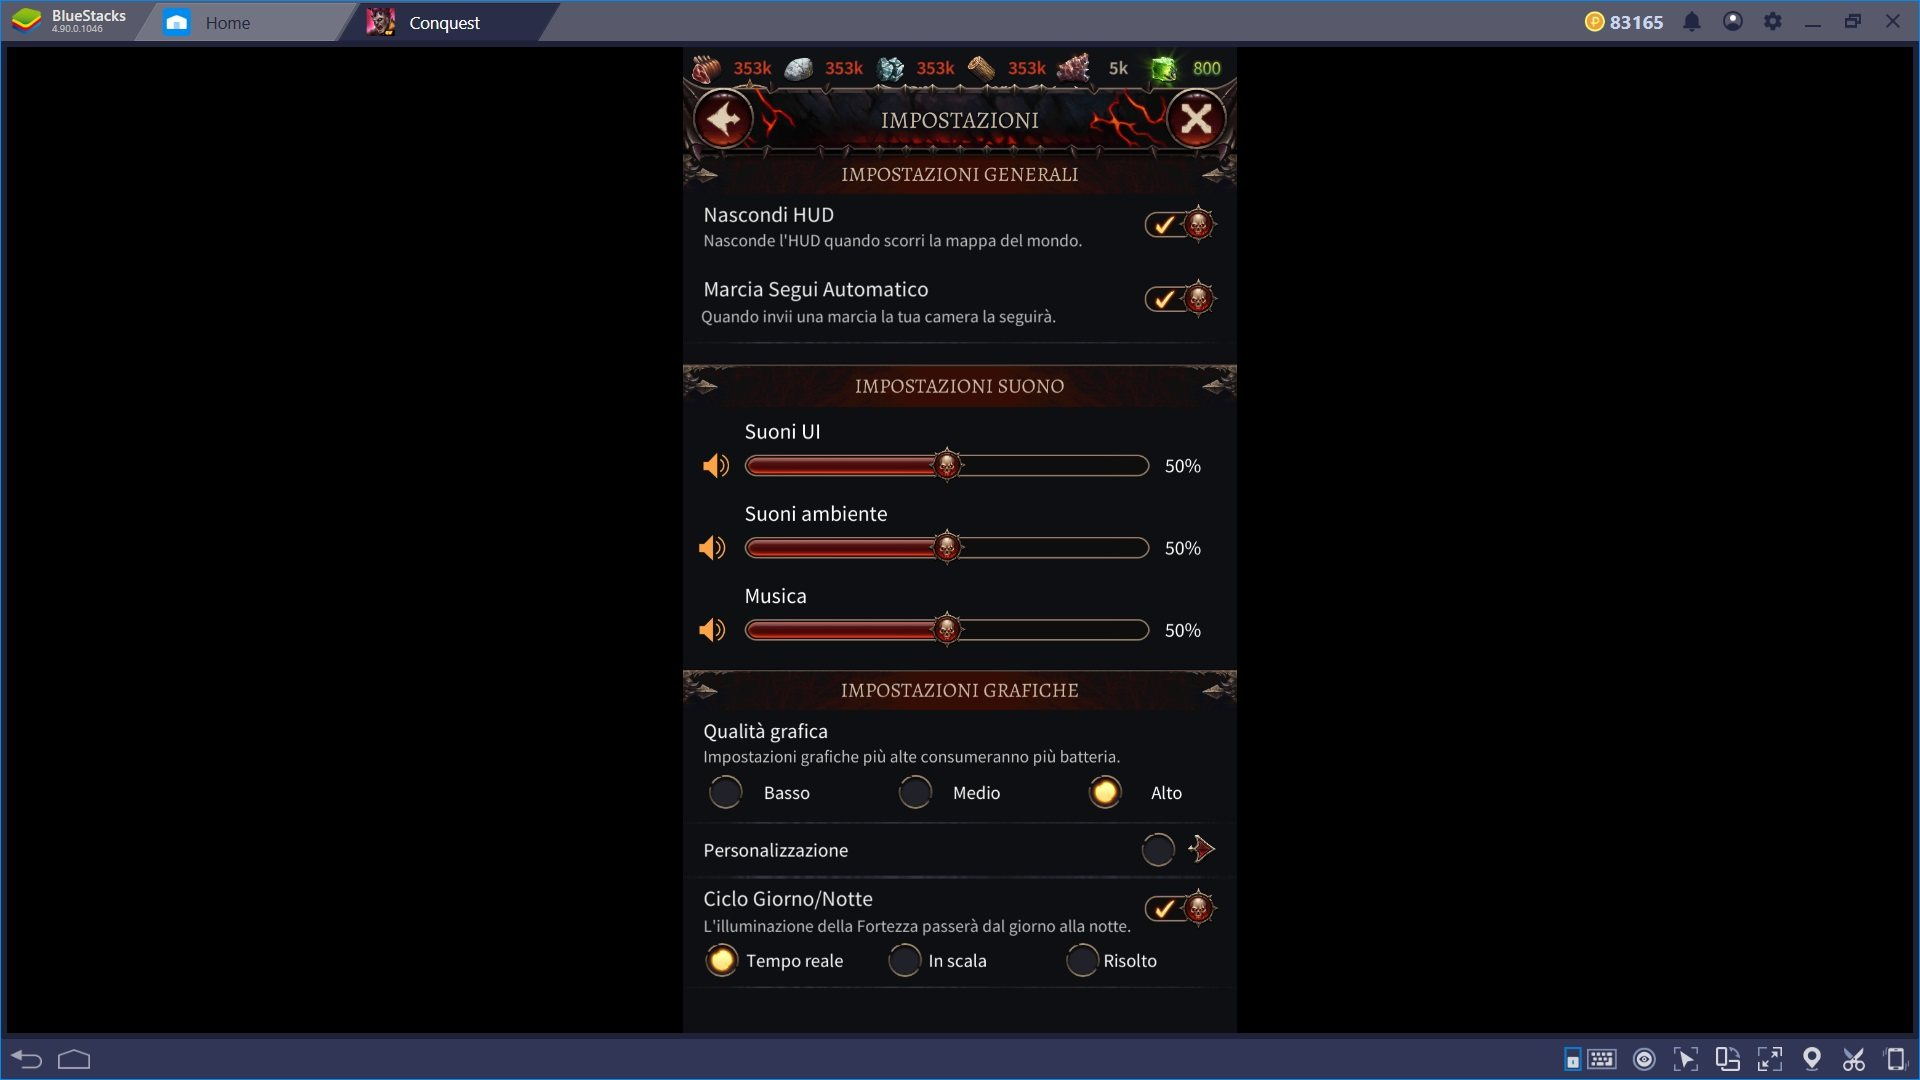 Gioca Warhammer Chaos & Conquest con Bluestacks 4